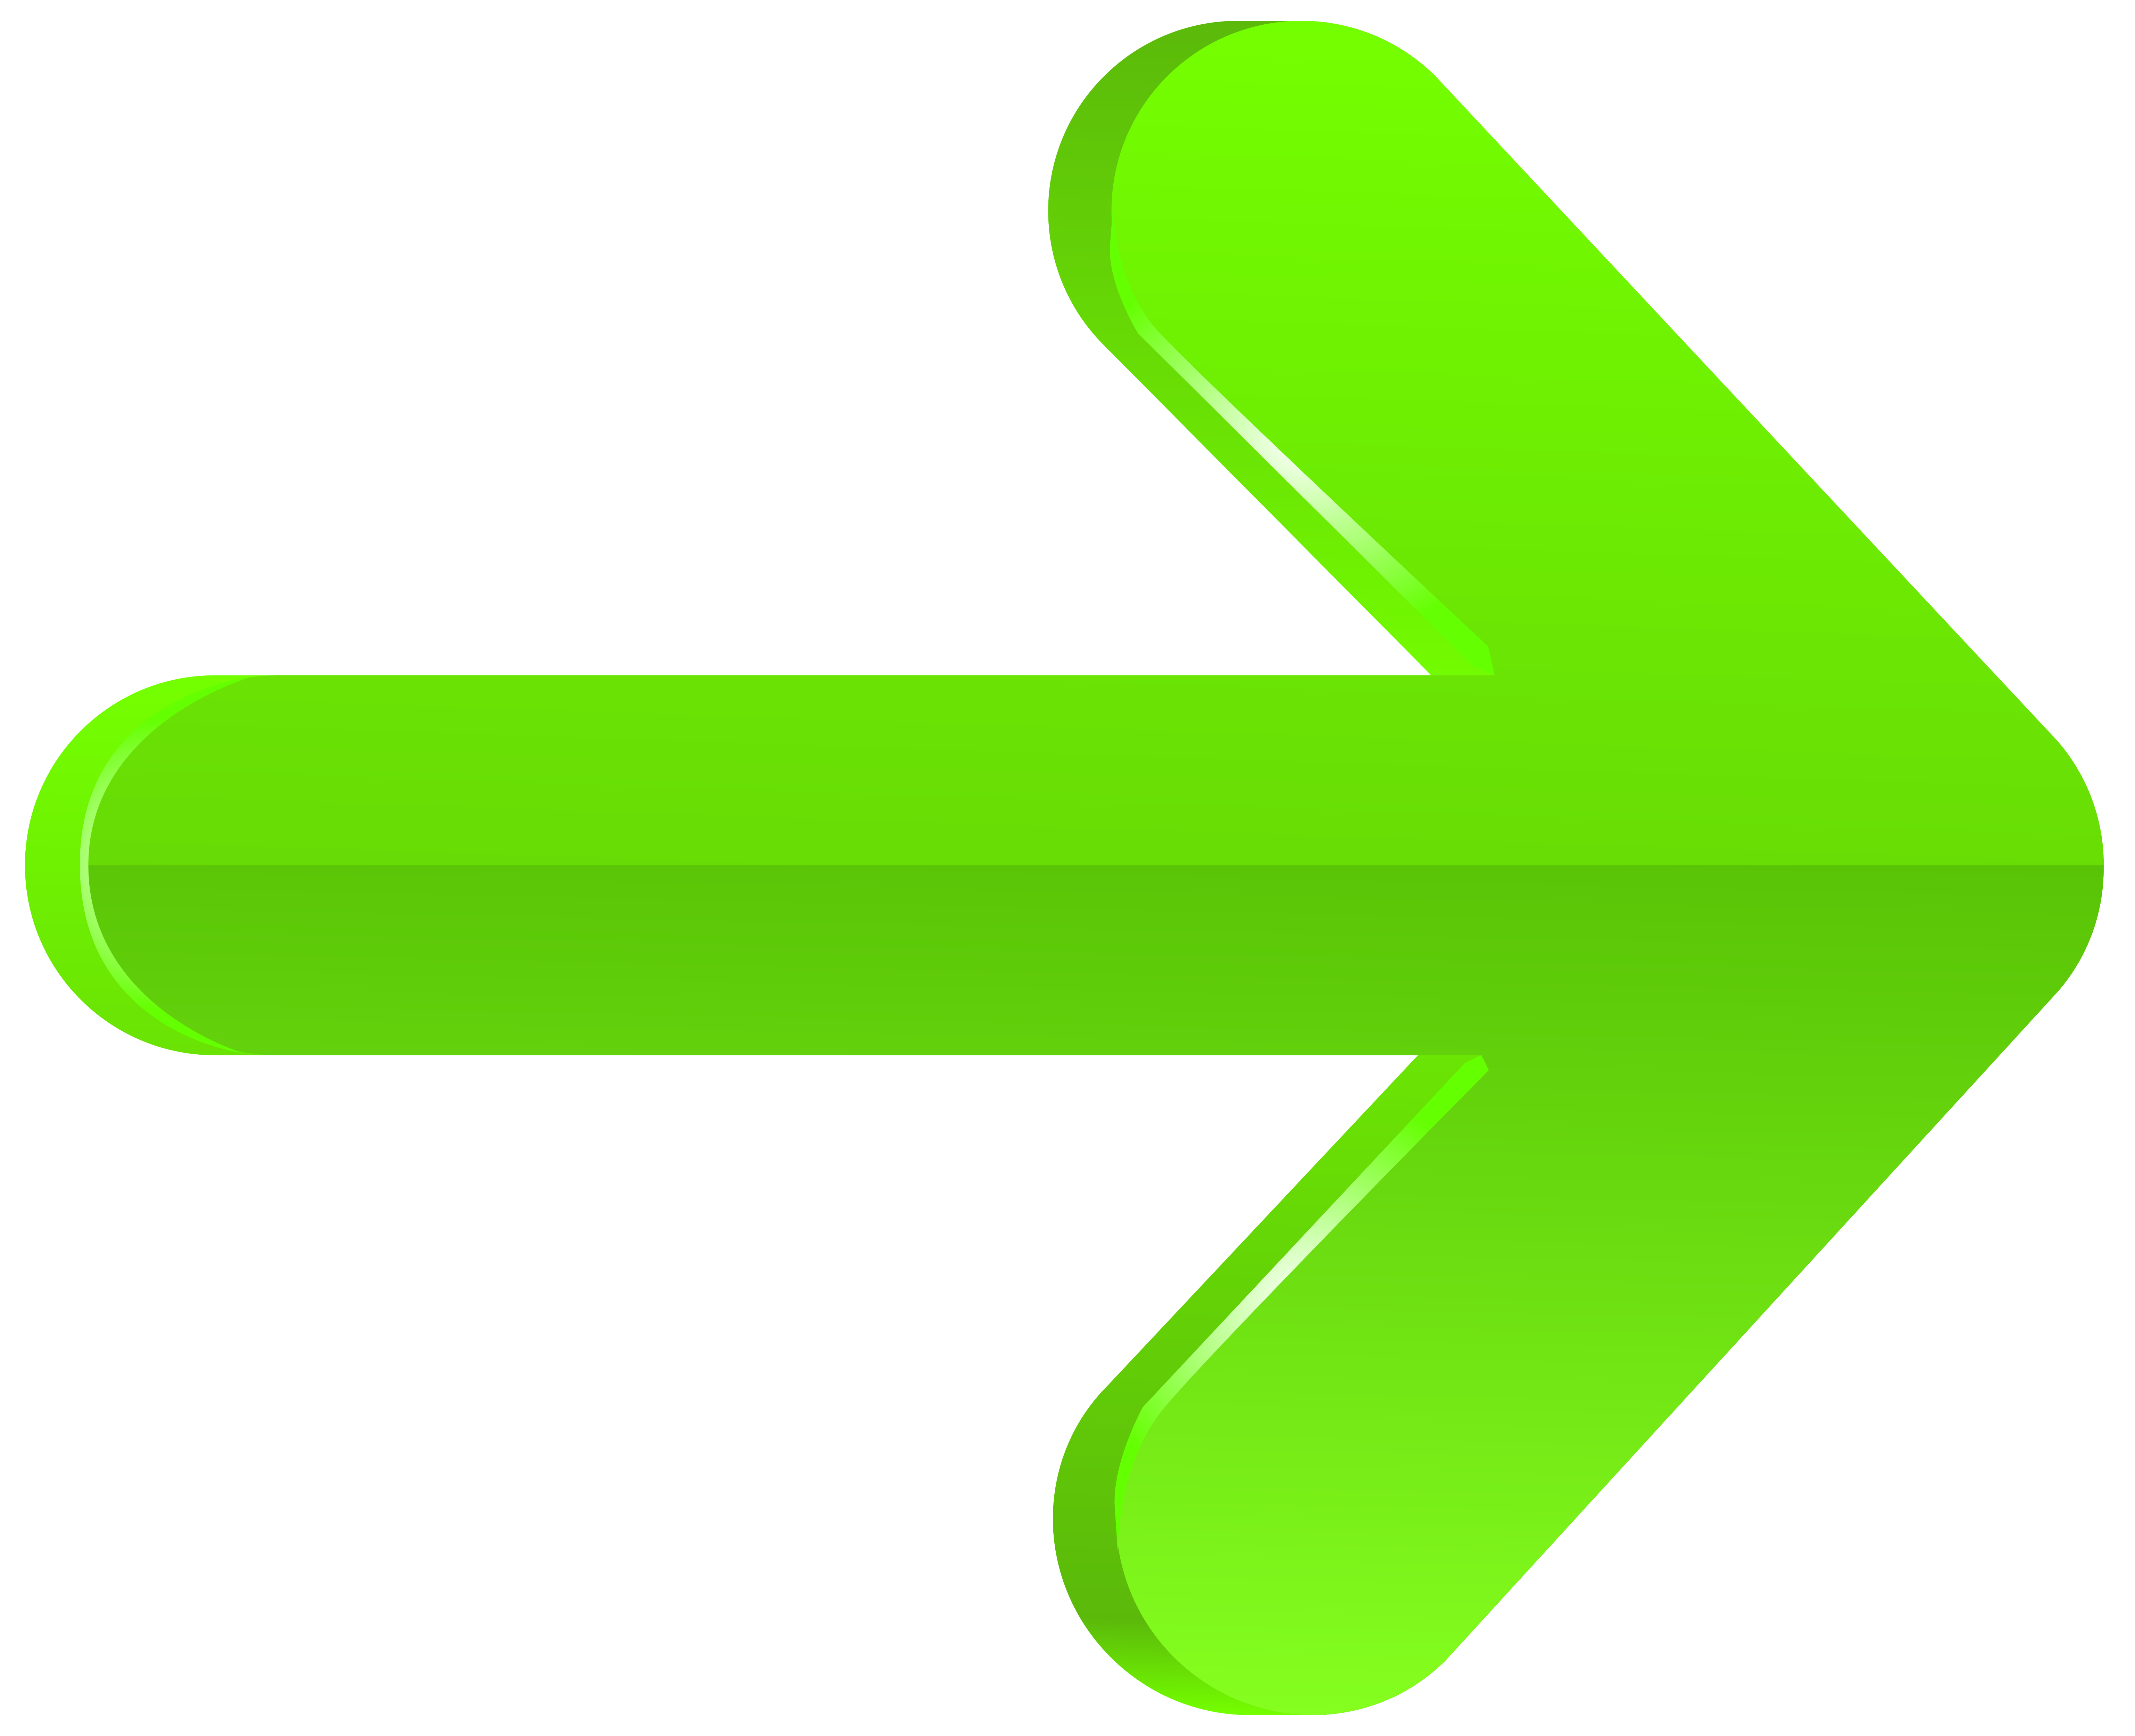 Arrow clipart clip transparent Green Arrow Clipart at GetDrawings.com | Free for personal use Green ... clip transparent